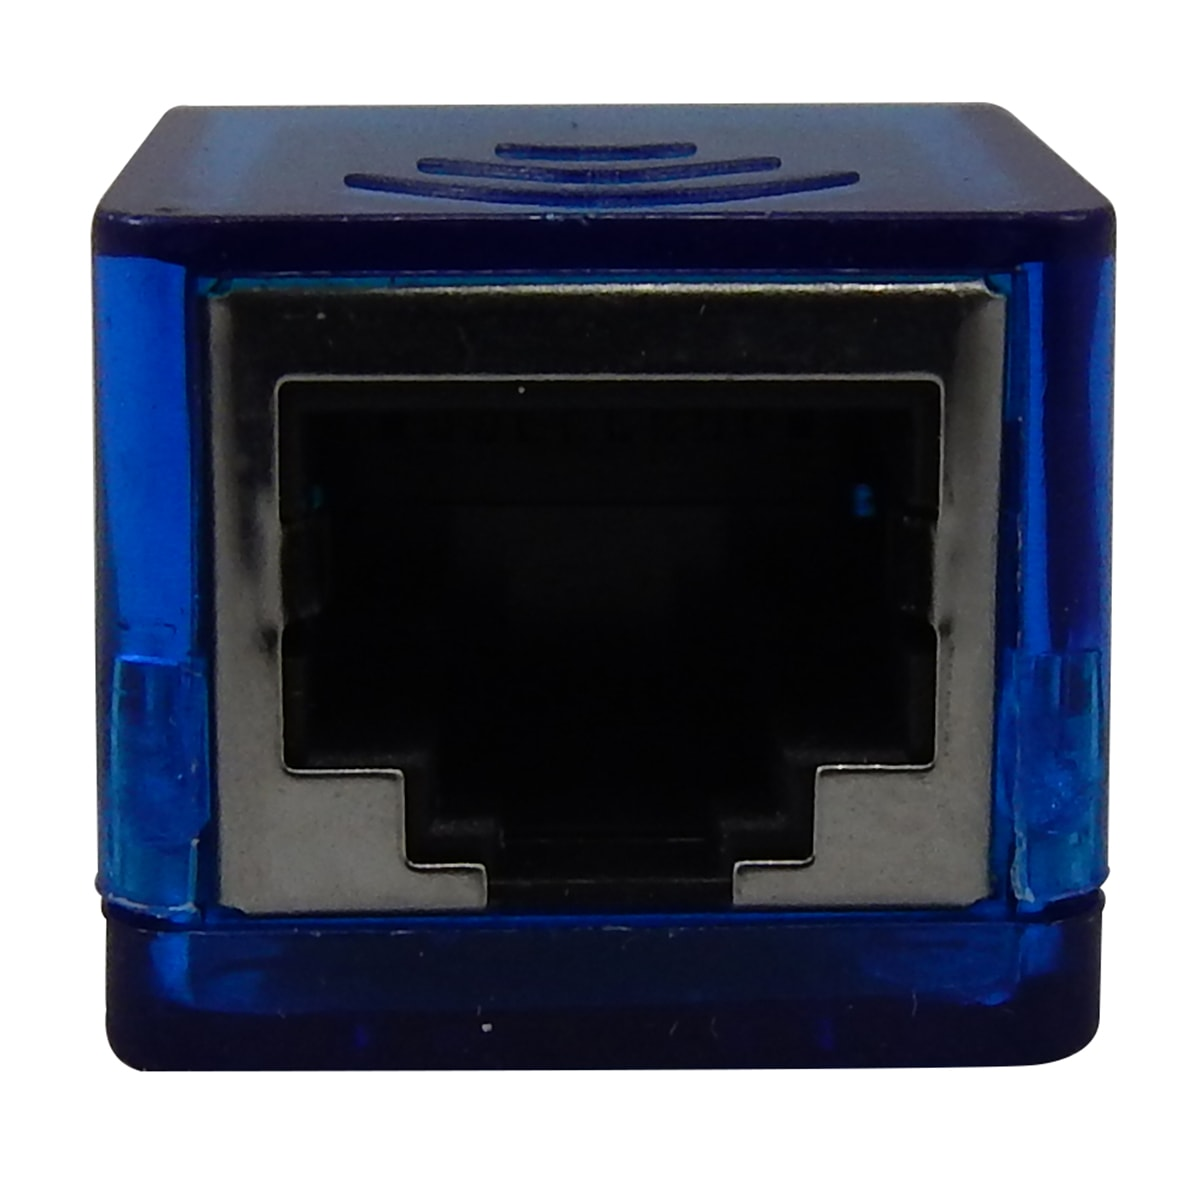 Adaptador USB 2.0 para Rede Lan RJ45 Exbom UL-100